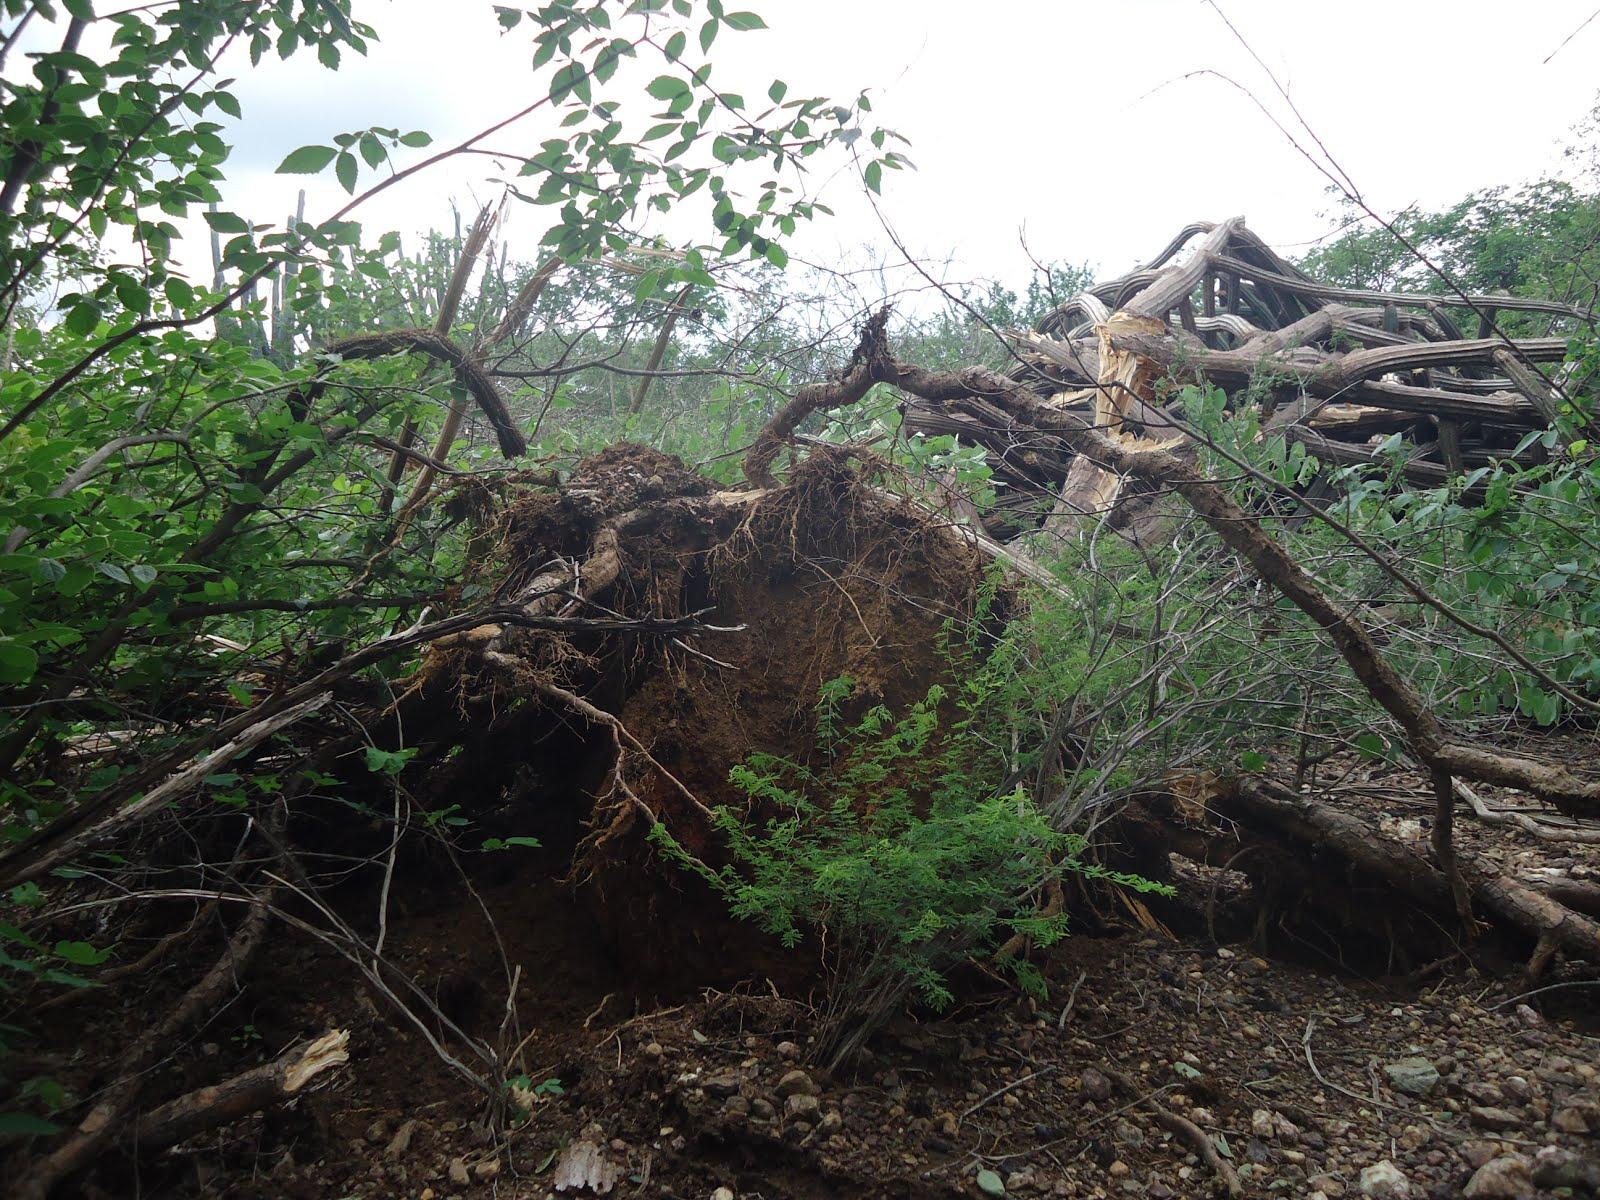 Planta de facheiro derrubada pelos ventos